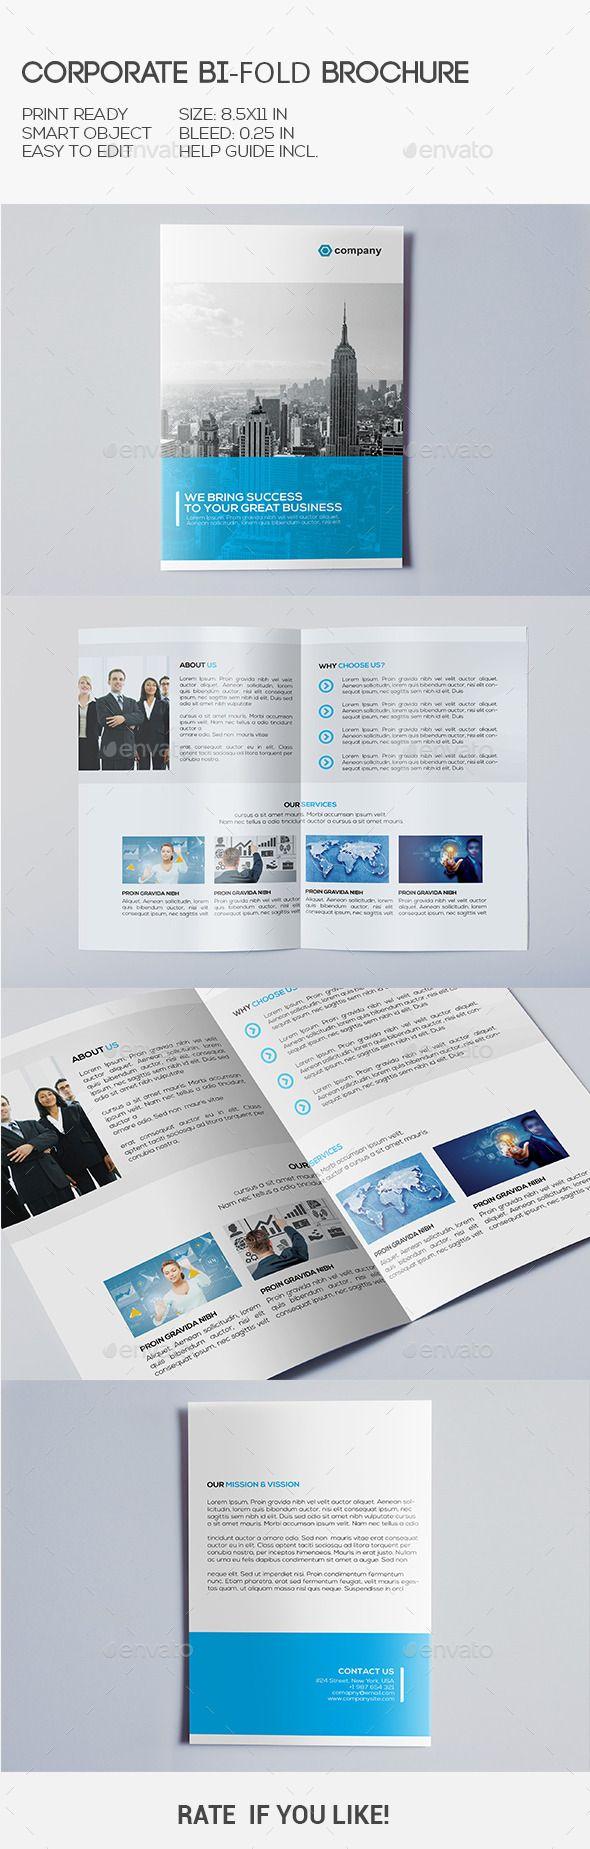 Corporate Bi-Fold Brochure Template Design #brochure #bifold Download: http://graphicriver.net/item/corporate-bifold-brochure/10451666?ref=ksioks